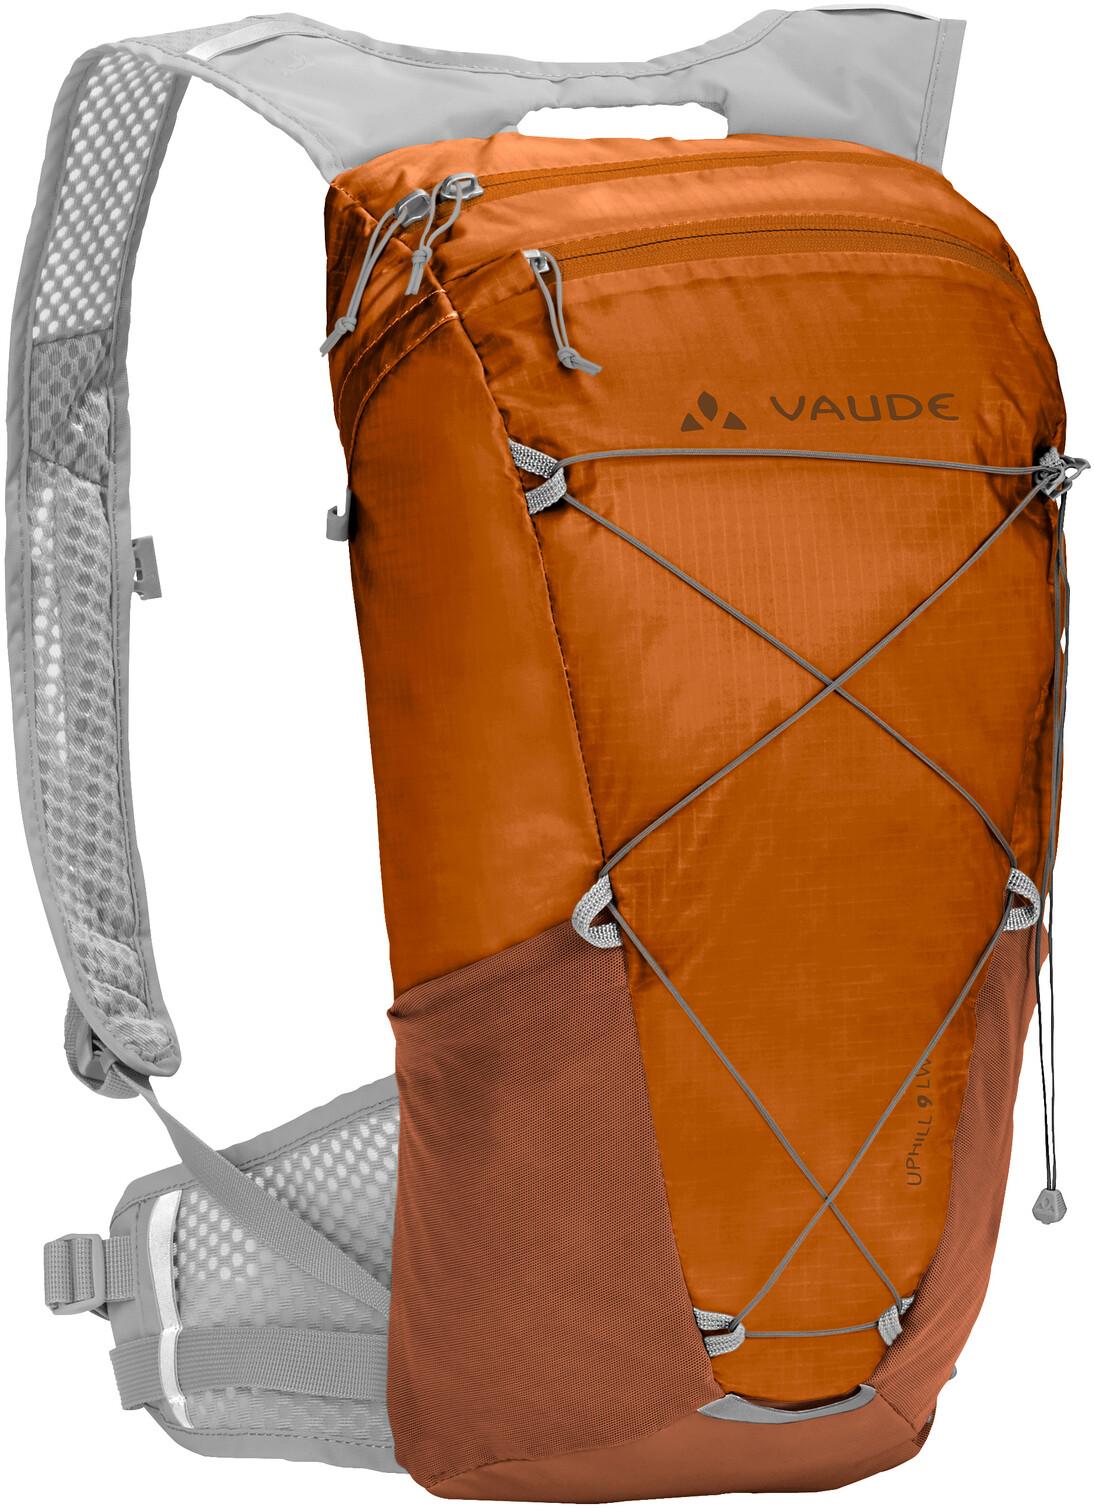 VAUDE Uphill 9 LW Rygsæk, orange madder (2019) | Travel bags